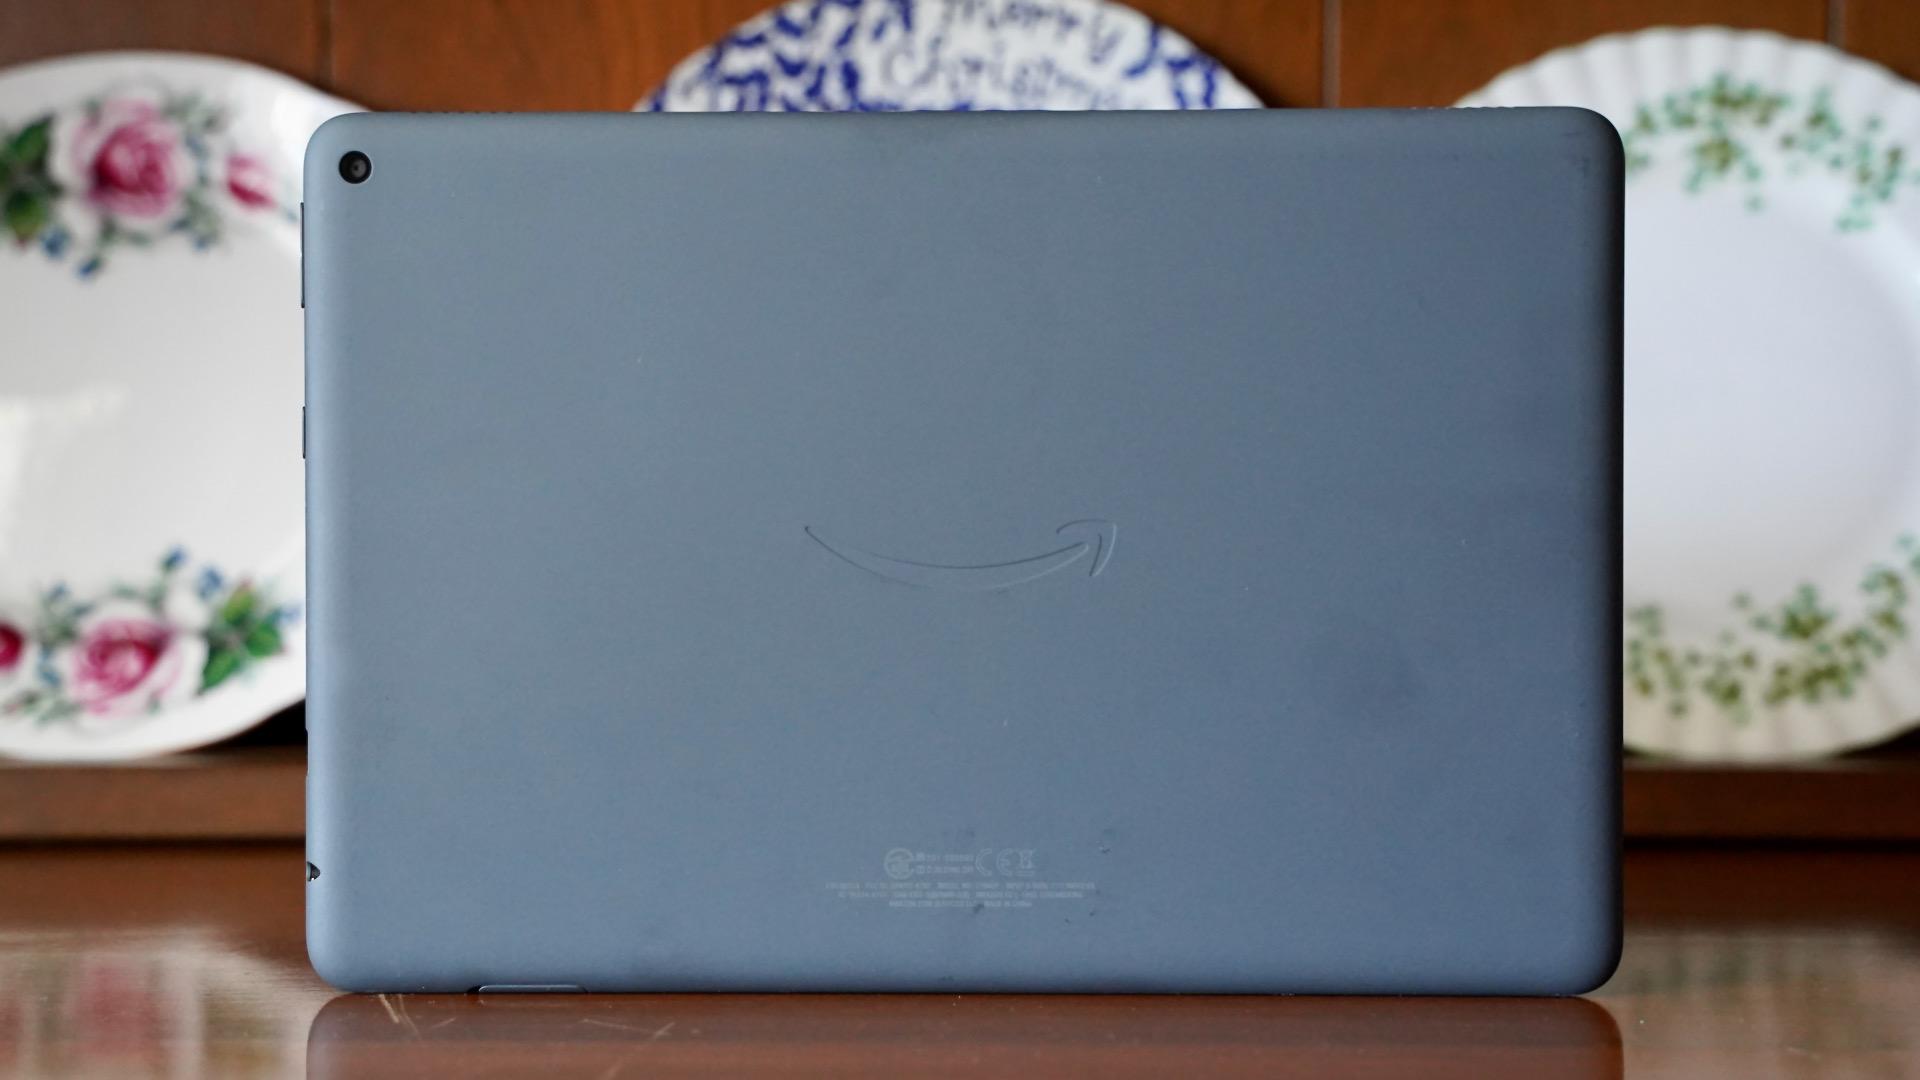 The Amazon Fire HD 10 Plus rear panel.